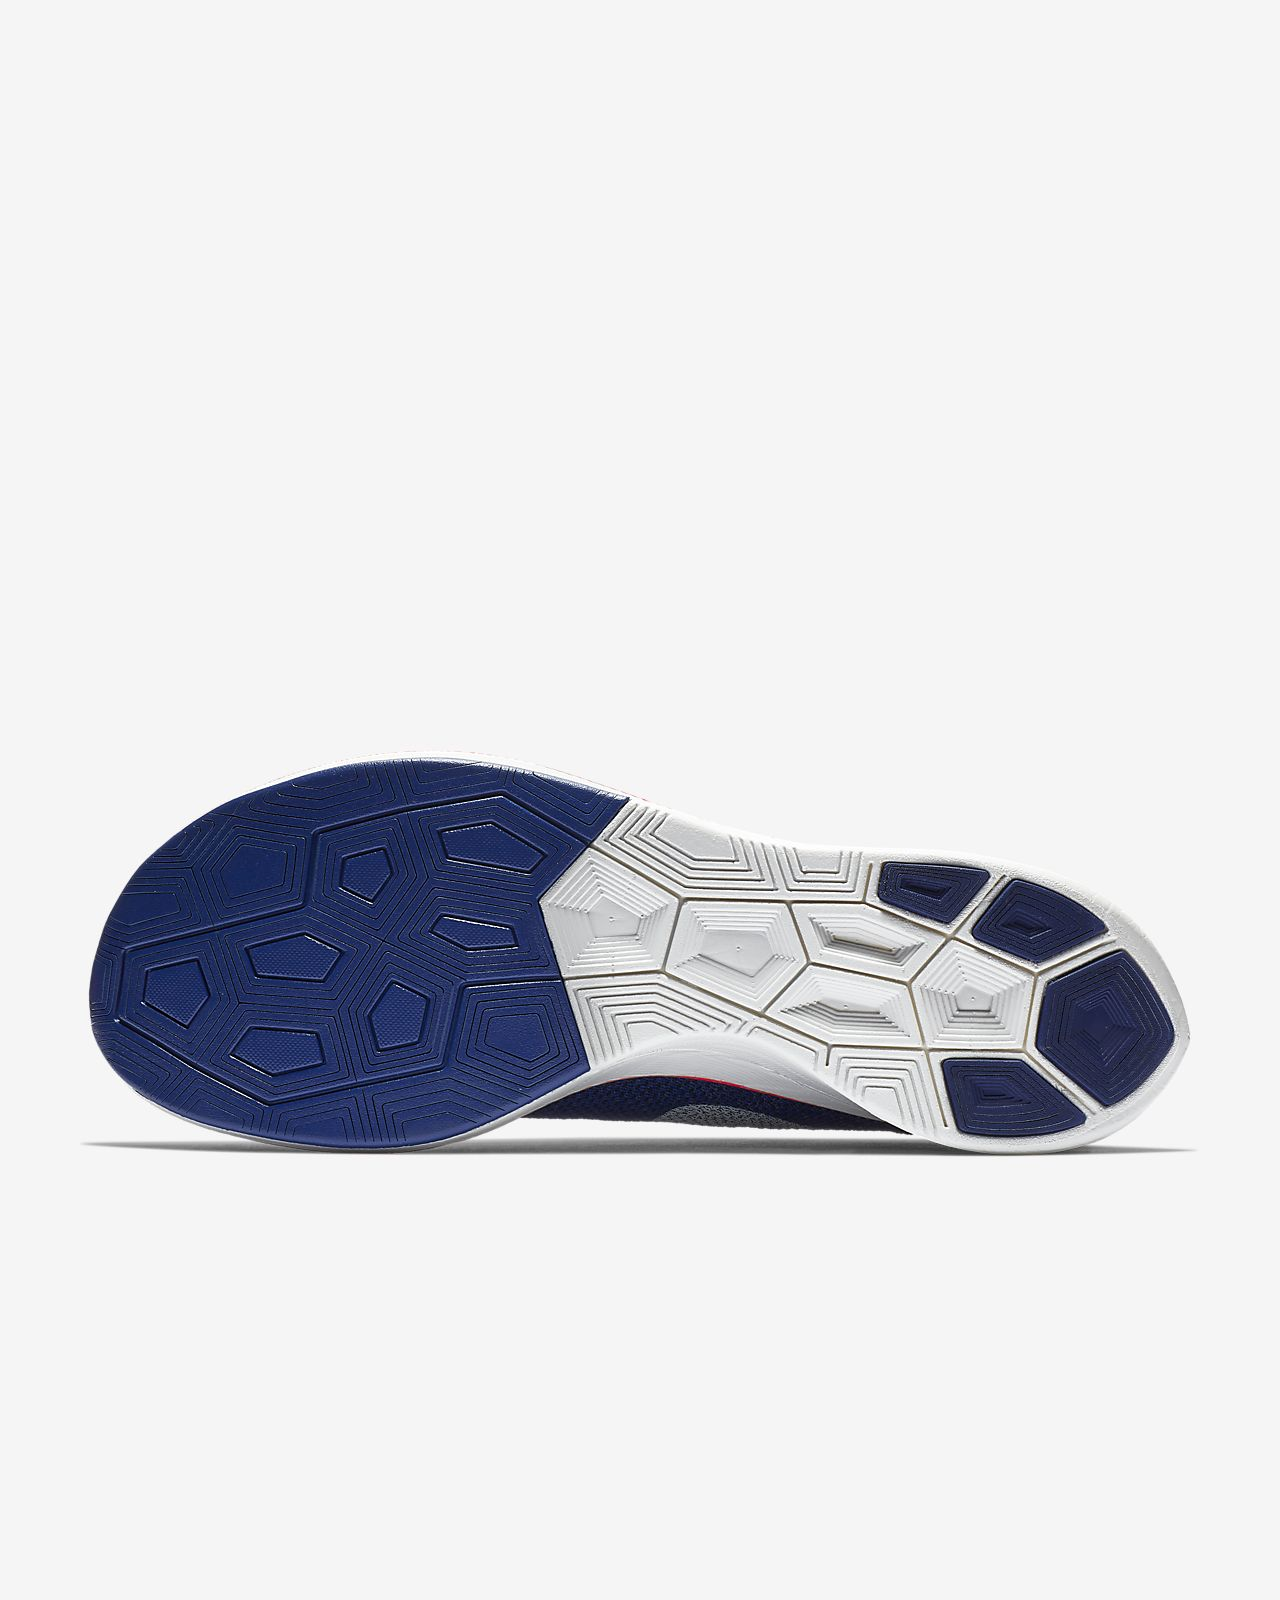 4111fdb6baa Nike Vaporfly 4% Flyknit Running Shoe. Nike.com IL